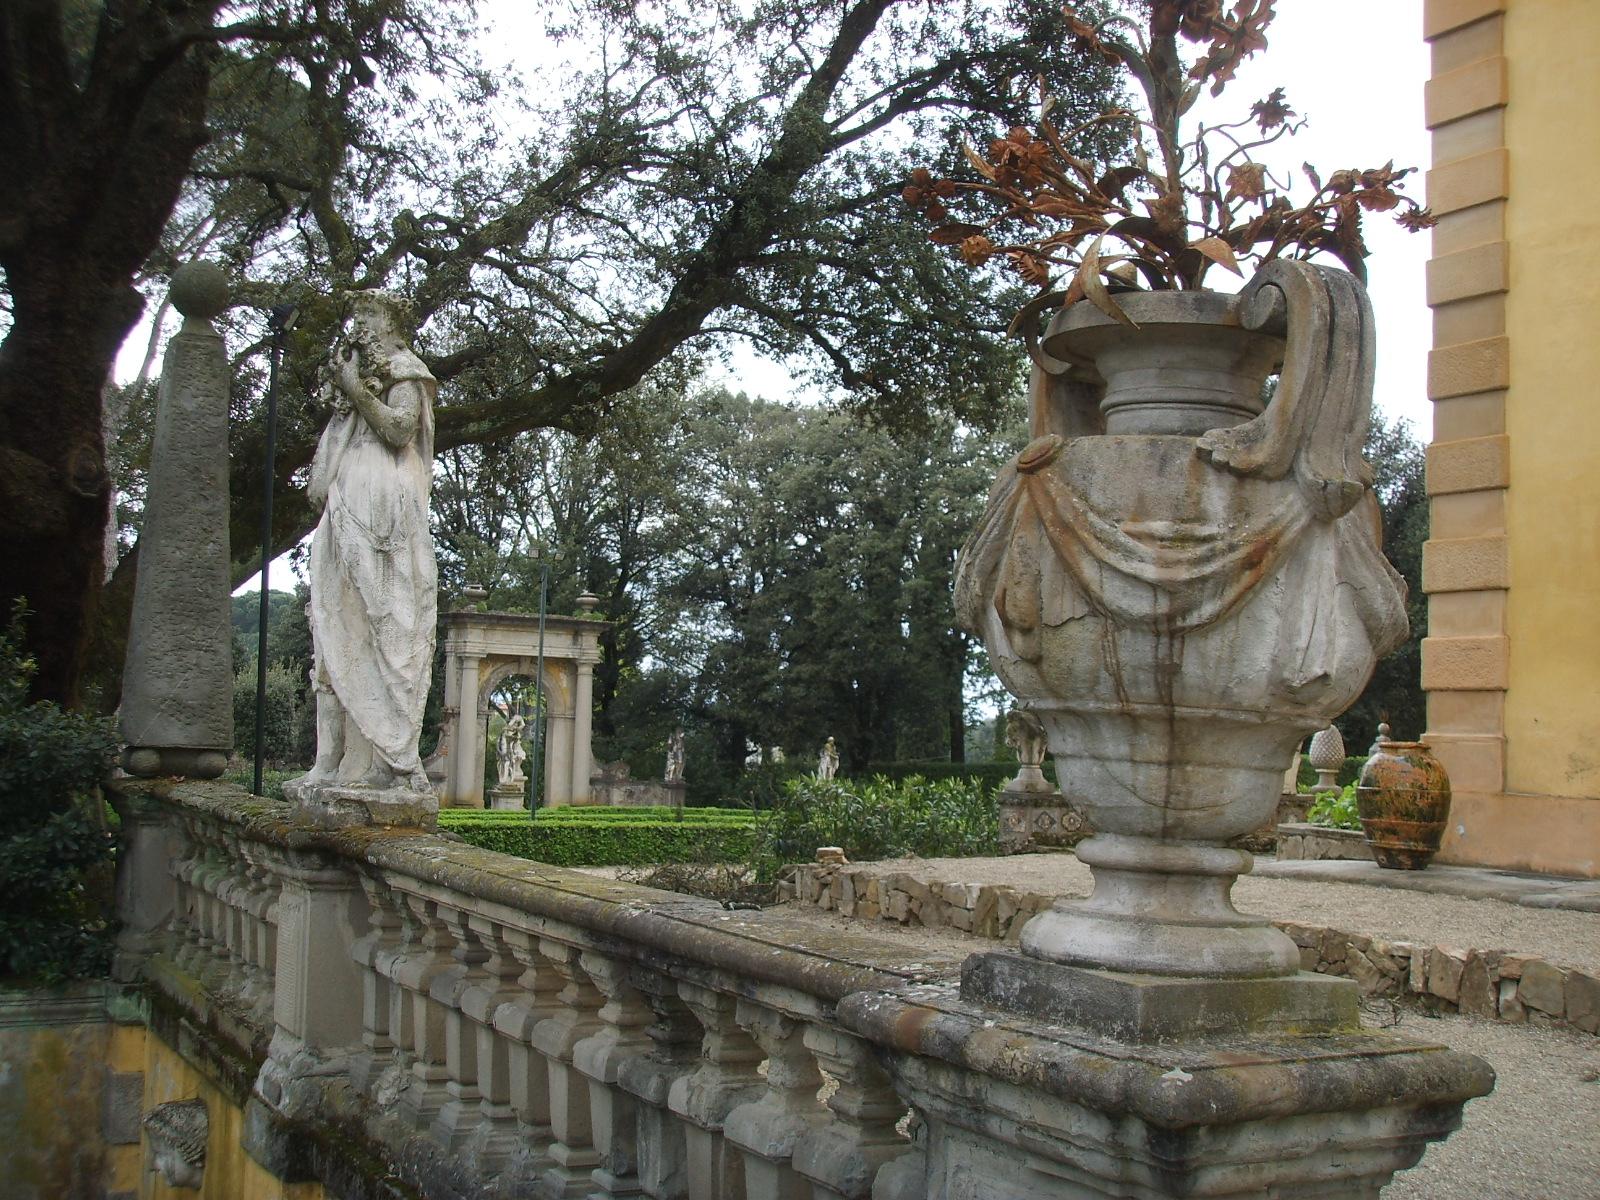 Vendita Pietre Da Giardino : Vendita pietre da giardino mobili lavelli sassi per giardino